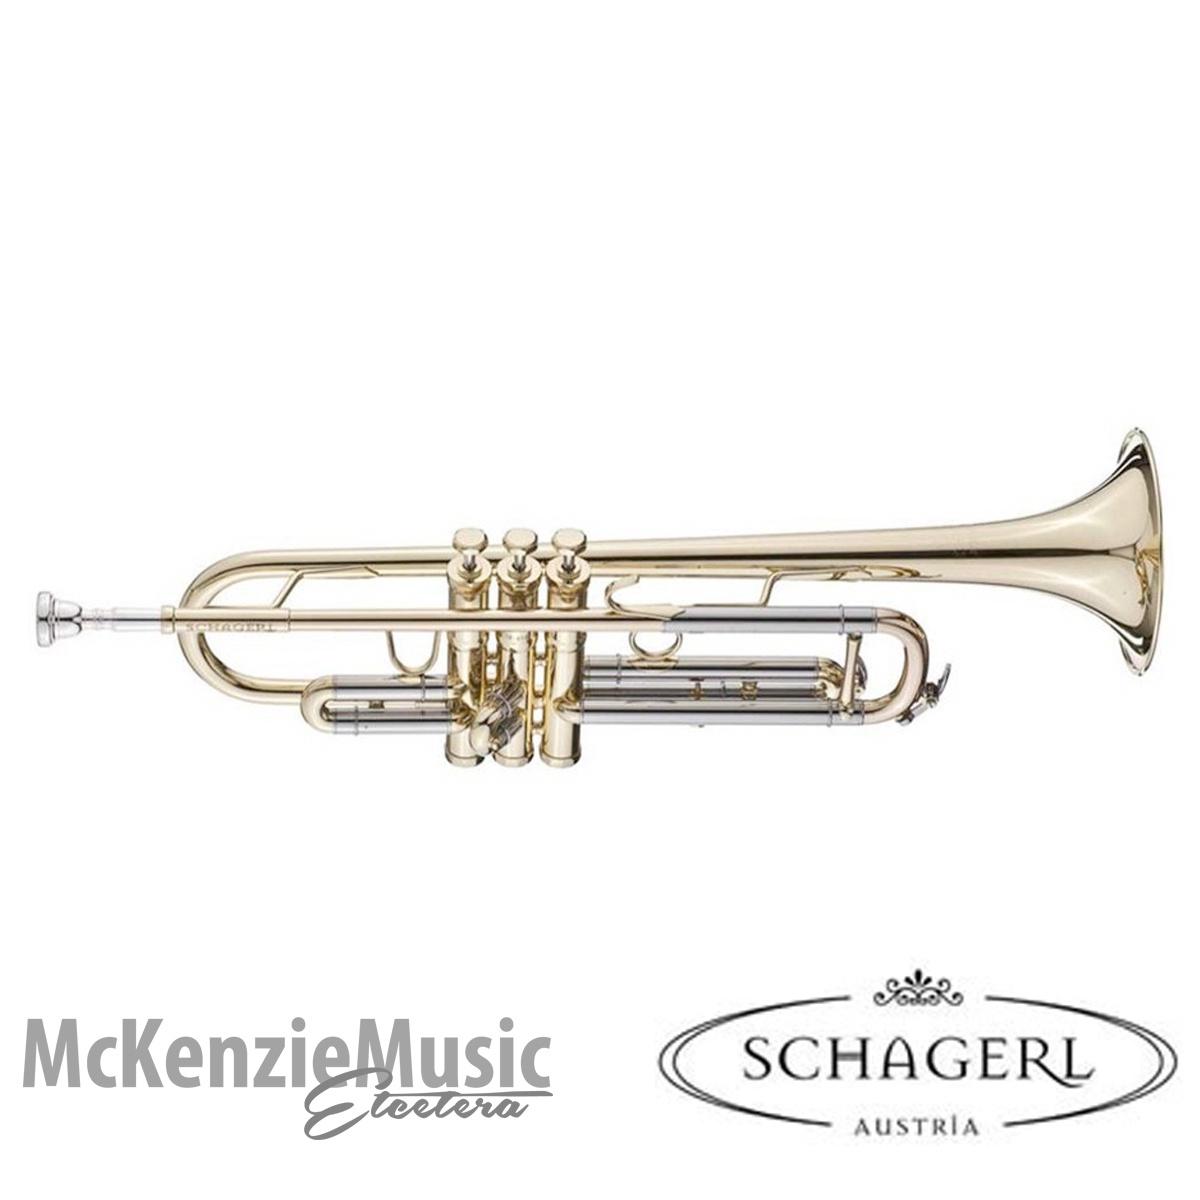 Schagerl Academica 610L Trumpet